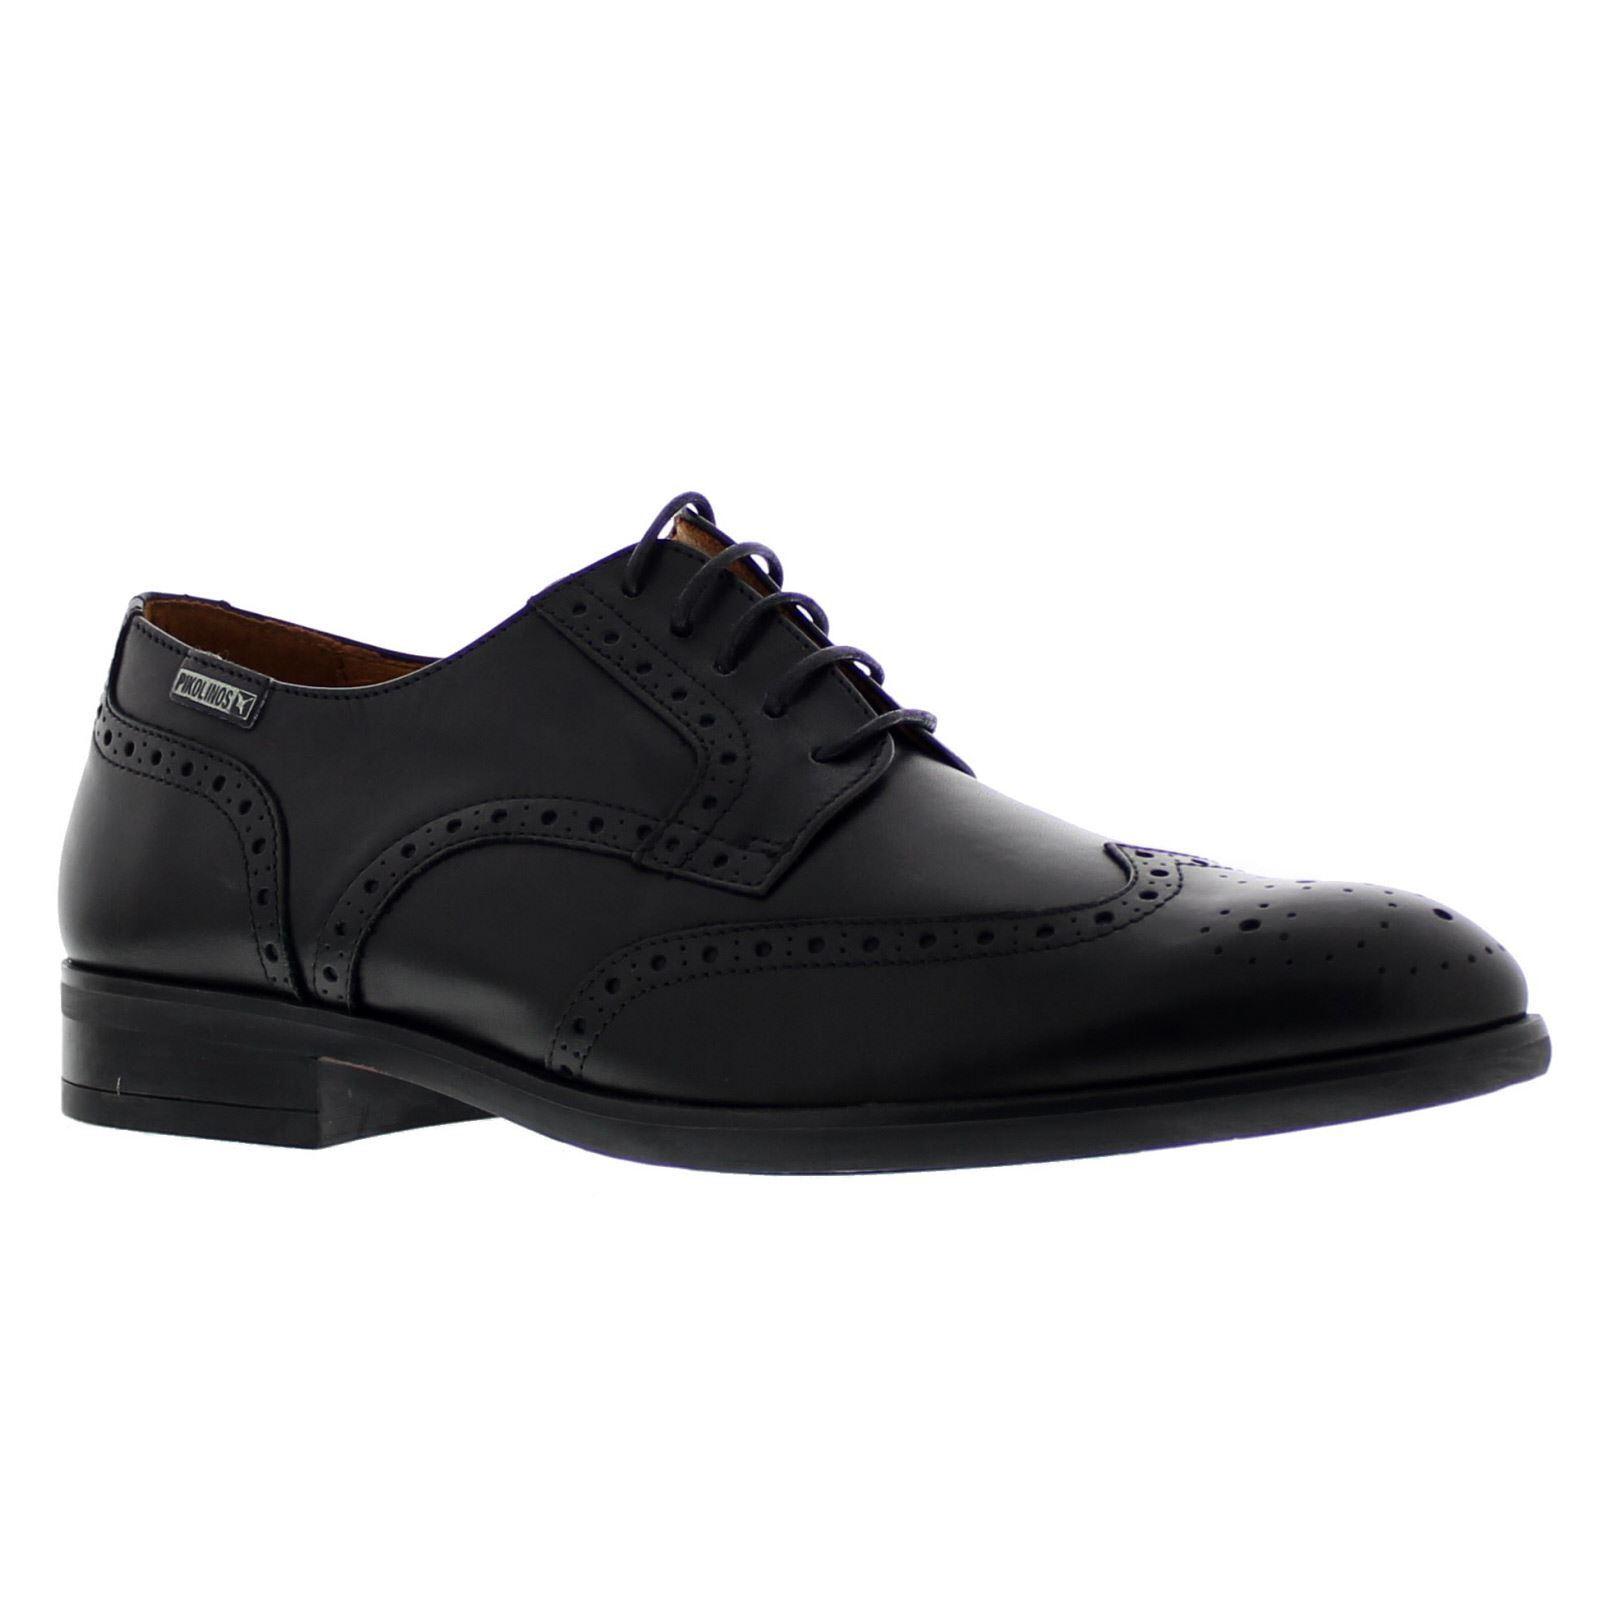 Pikolinos Bristol M7J-4186 Black Mens Leather Brogue Laced Formal Shoes